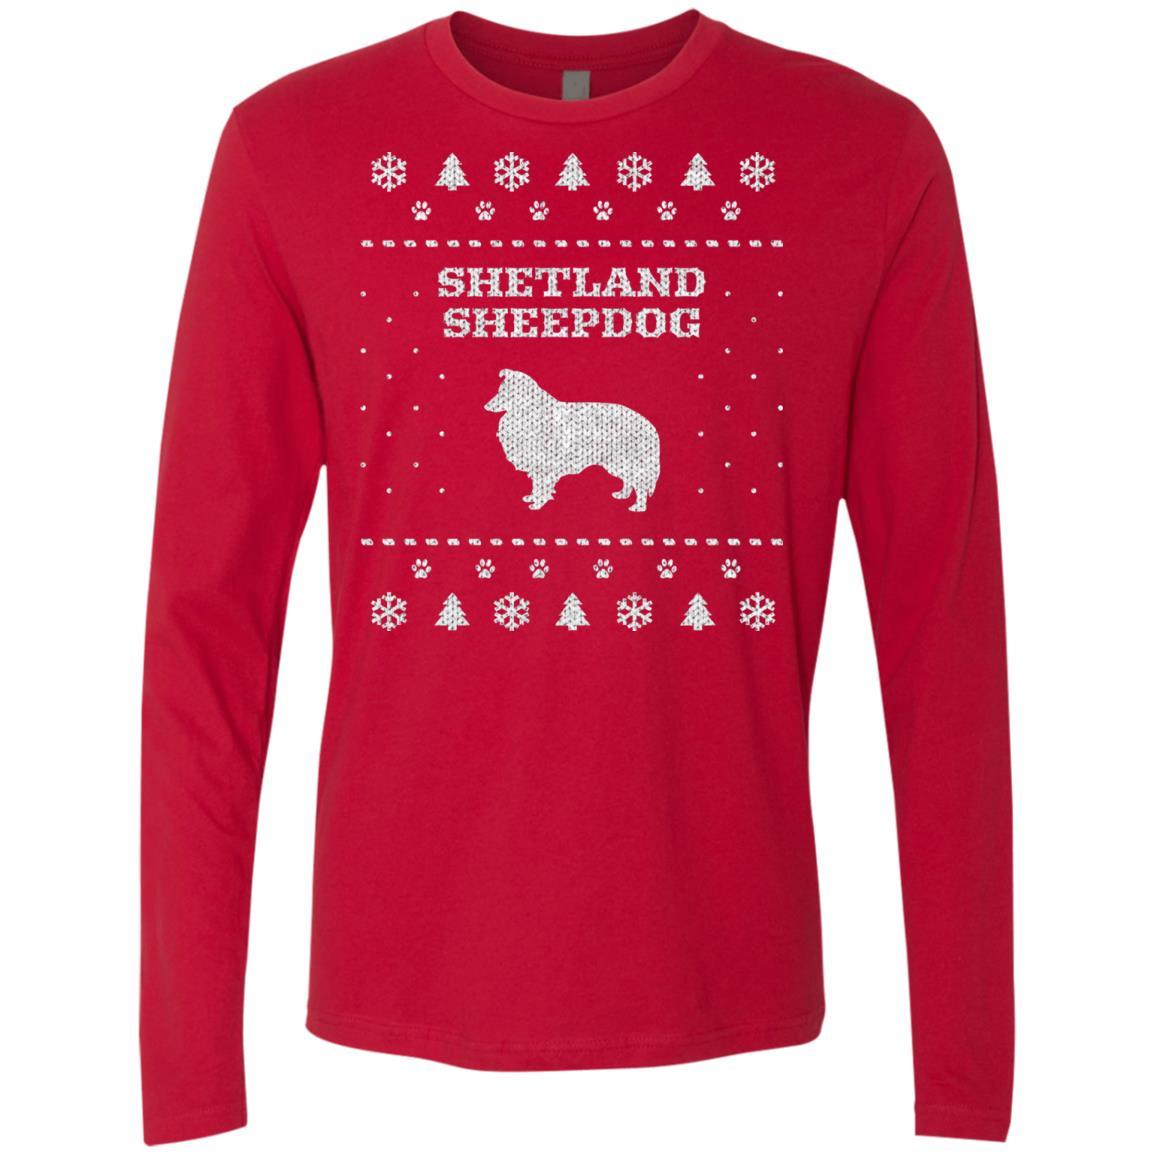 Shetland sheepdog christmas premium long sleeve shirt iheartdogs shetland sheepdog christmas premium long sleeve shirt nvjuhfo Images